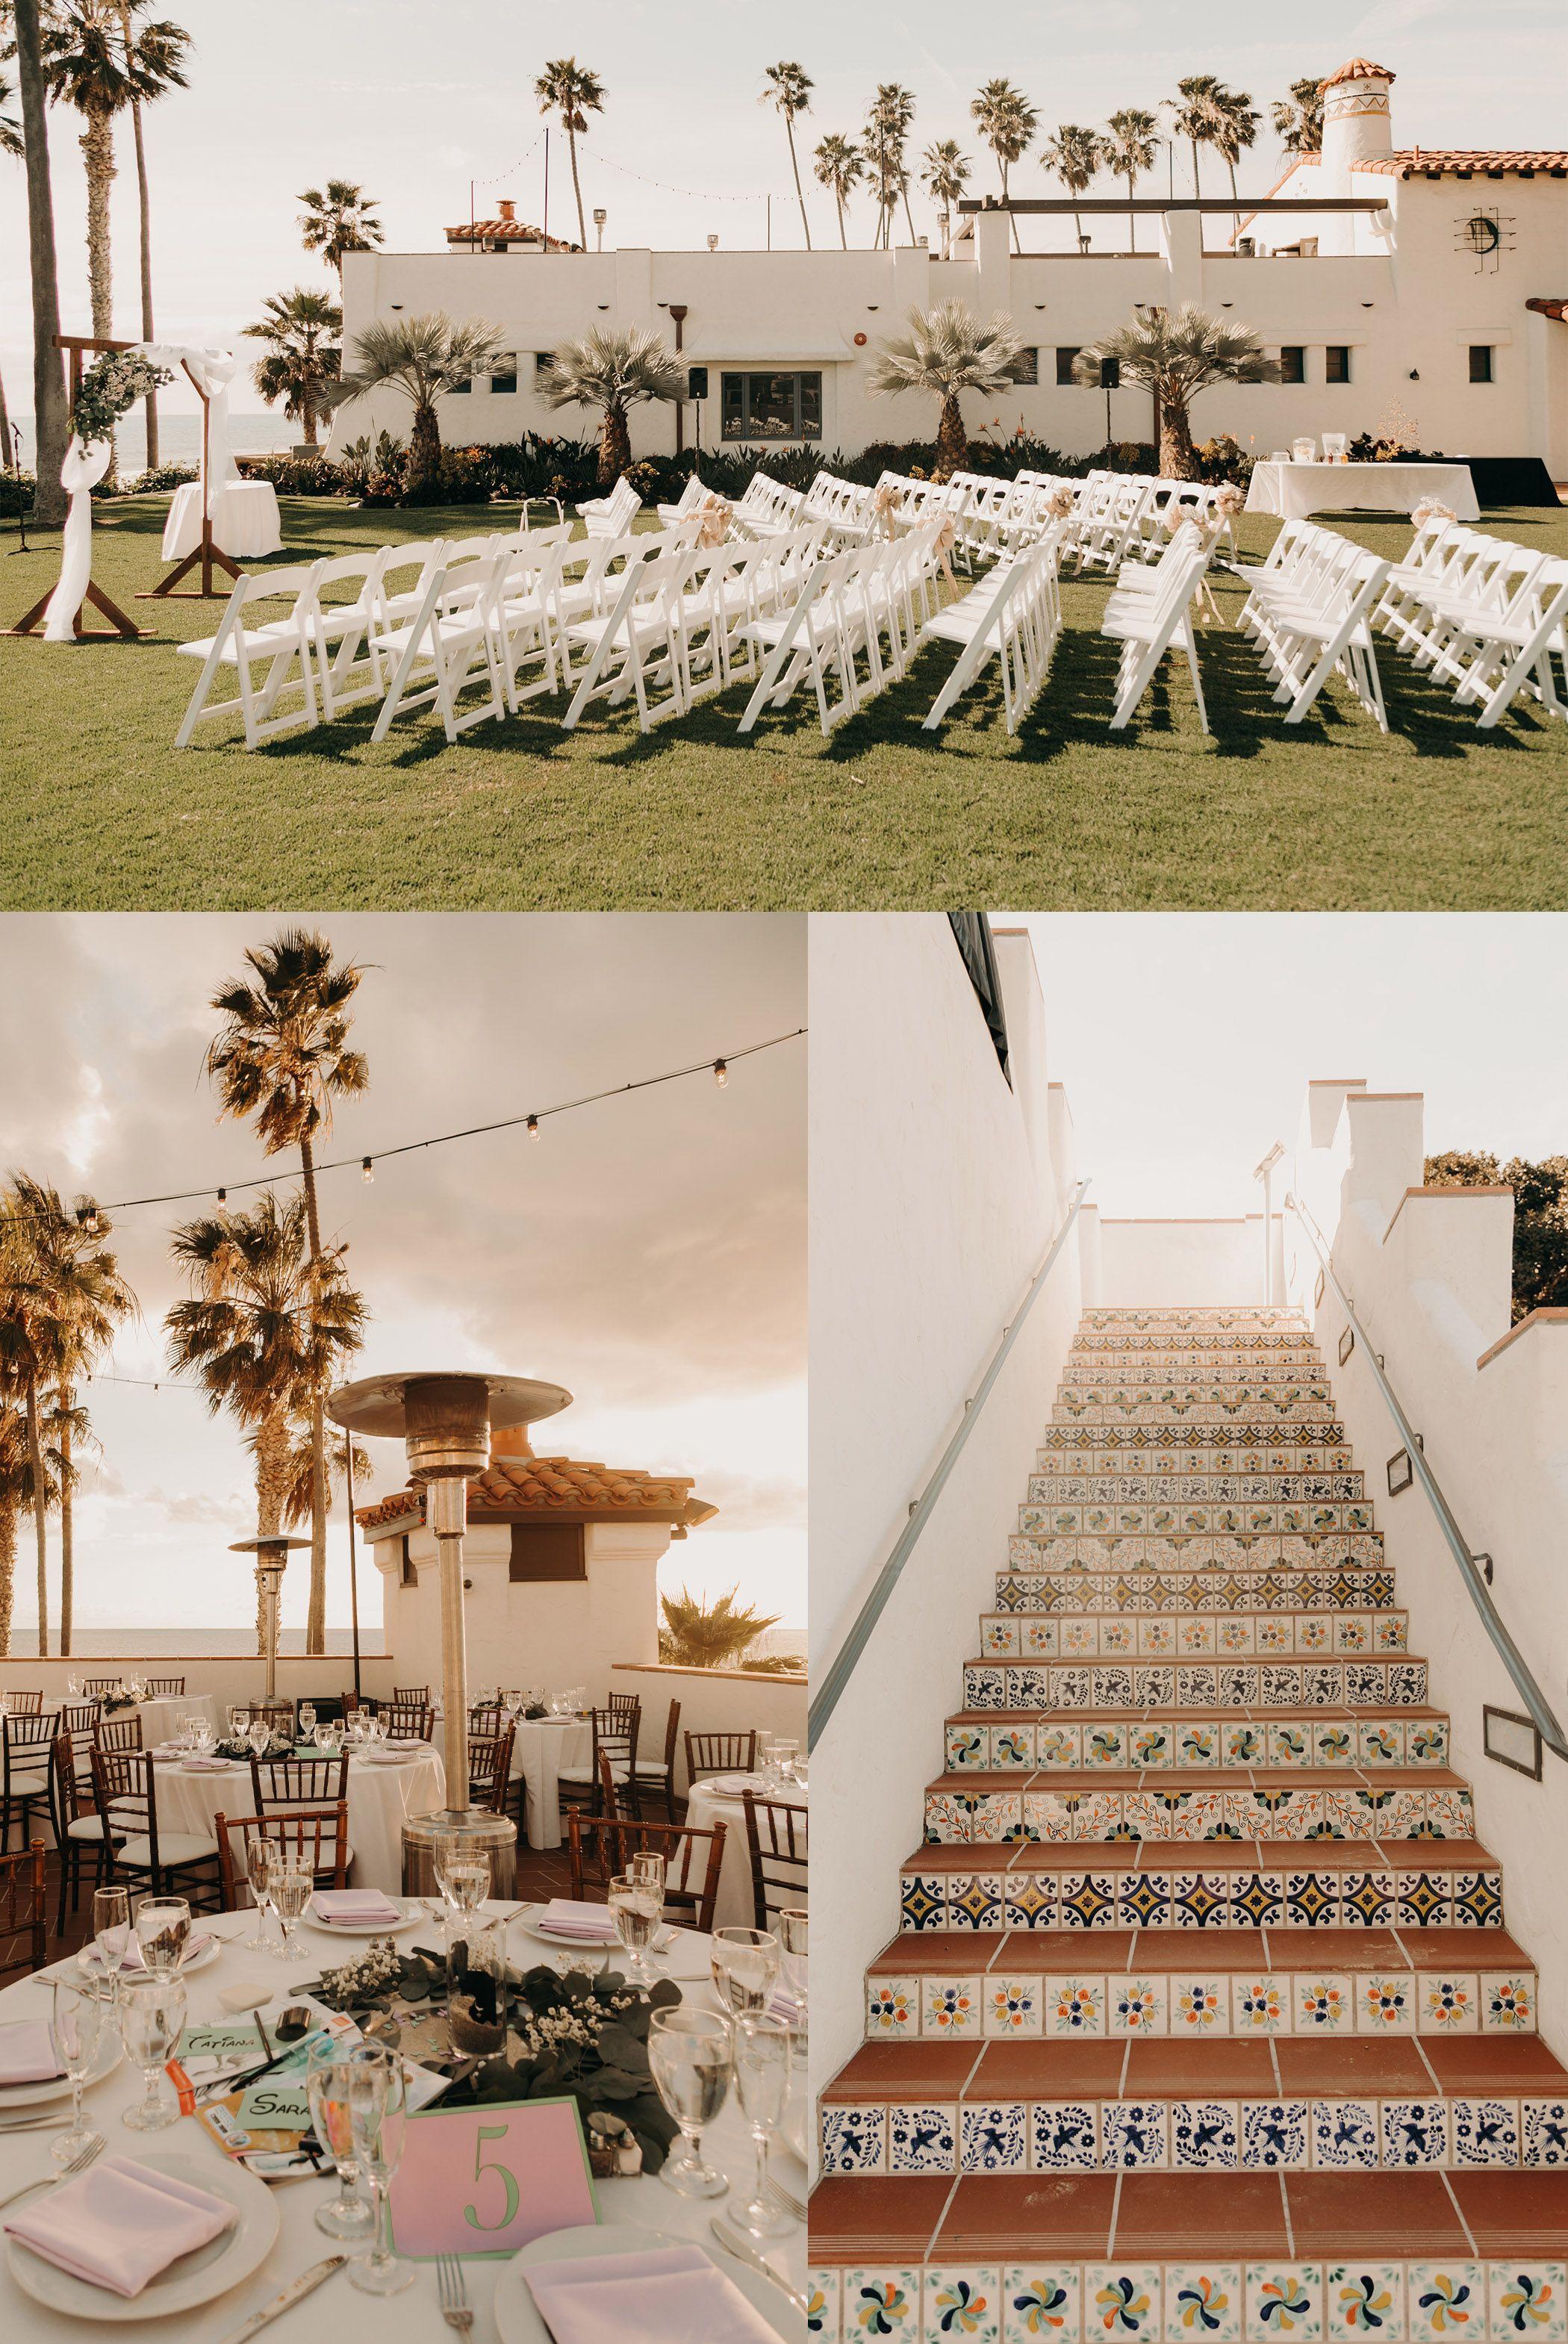 Ole hanson beach club is the perfect southern california